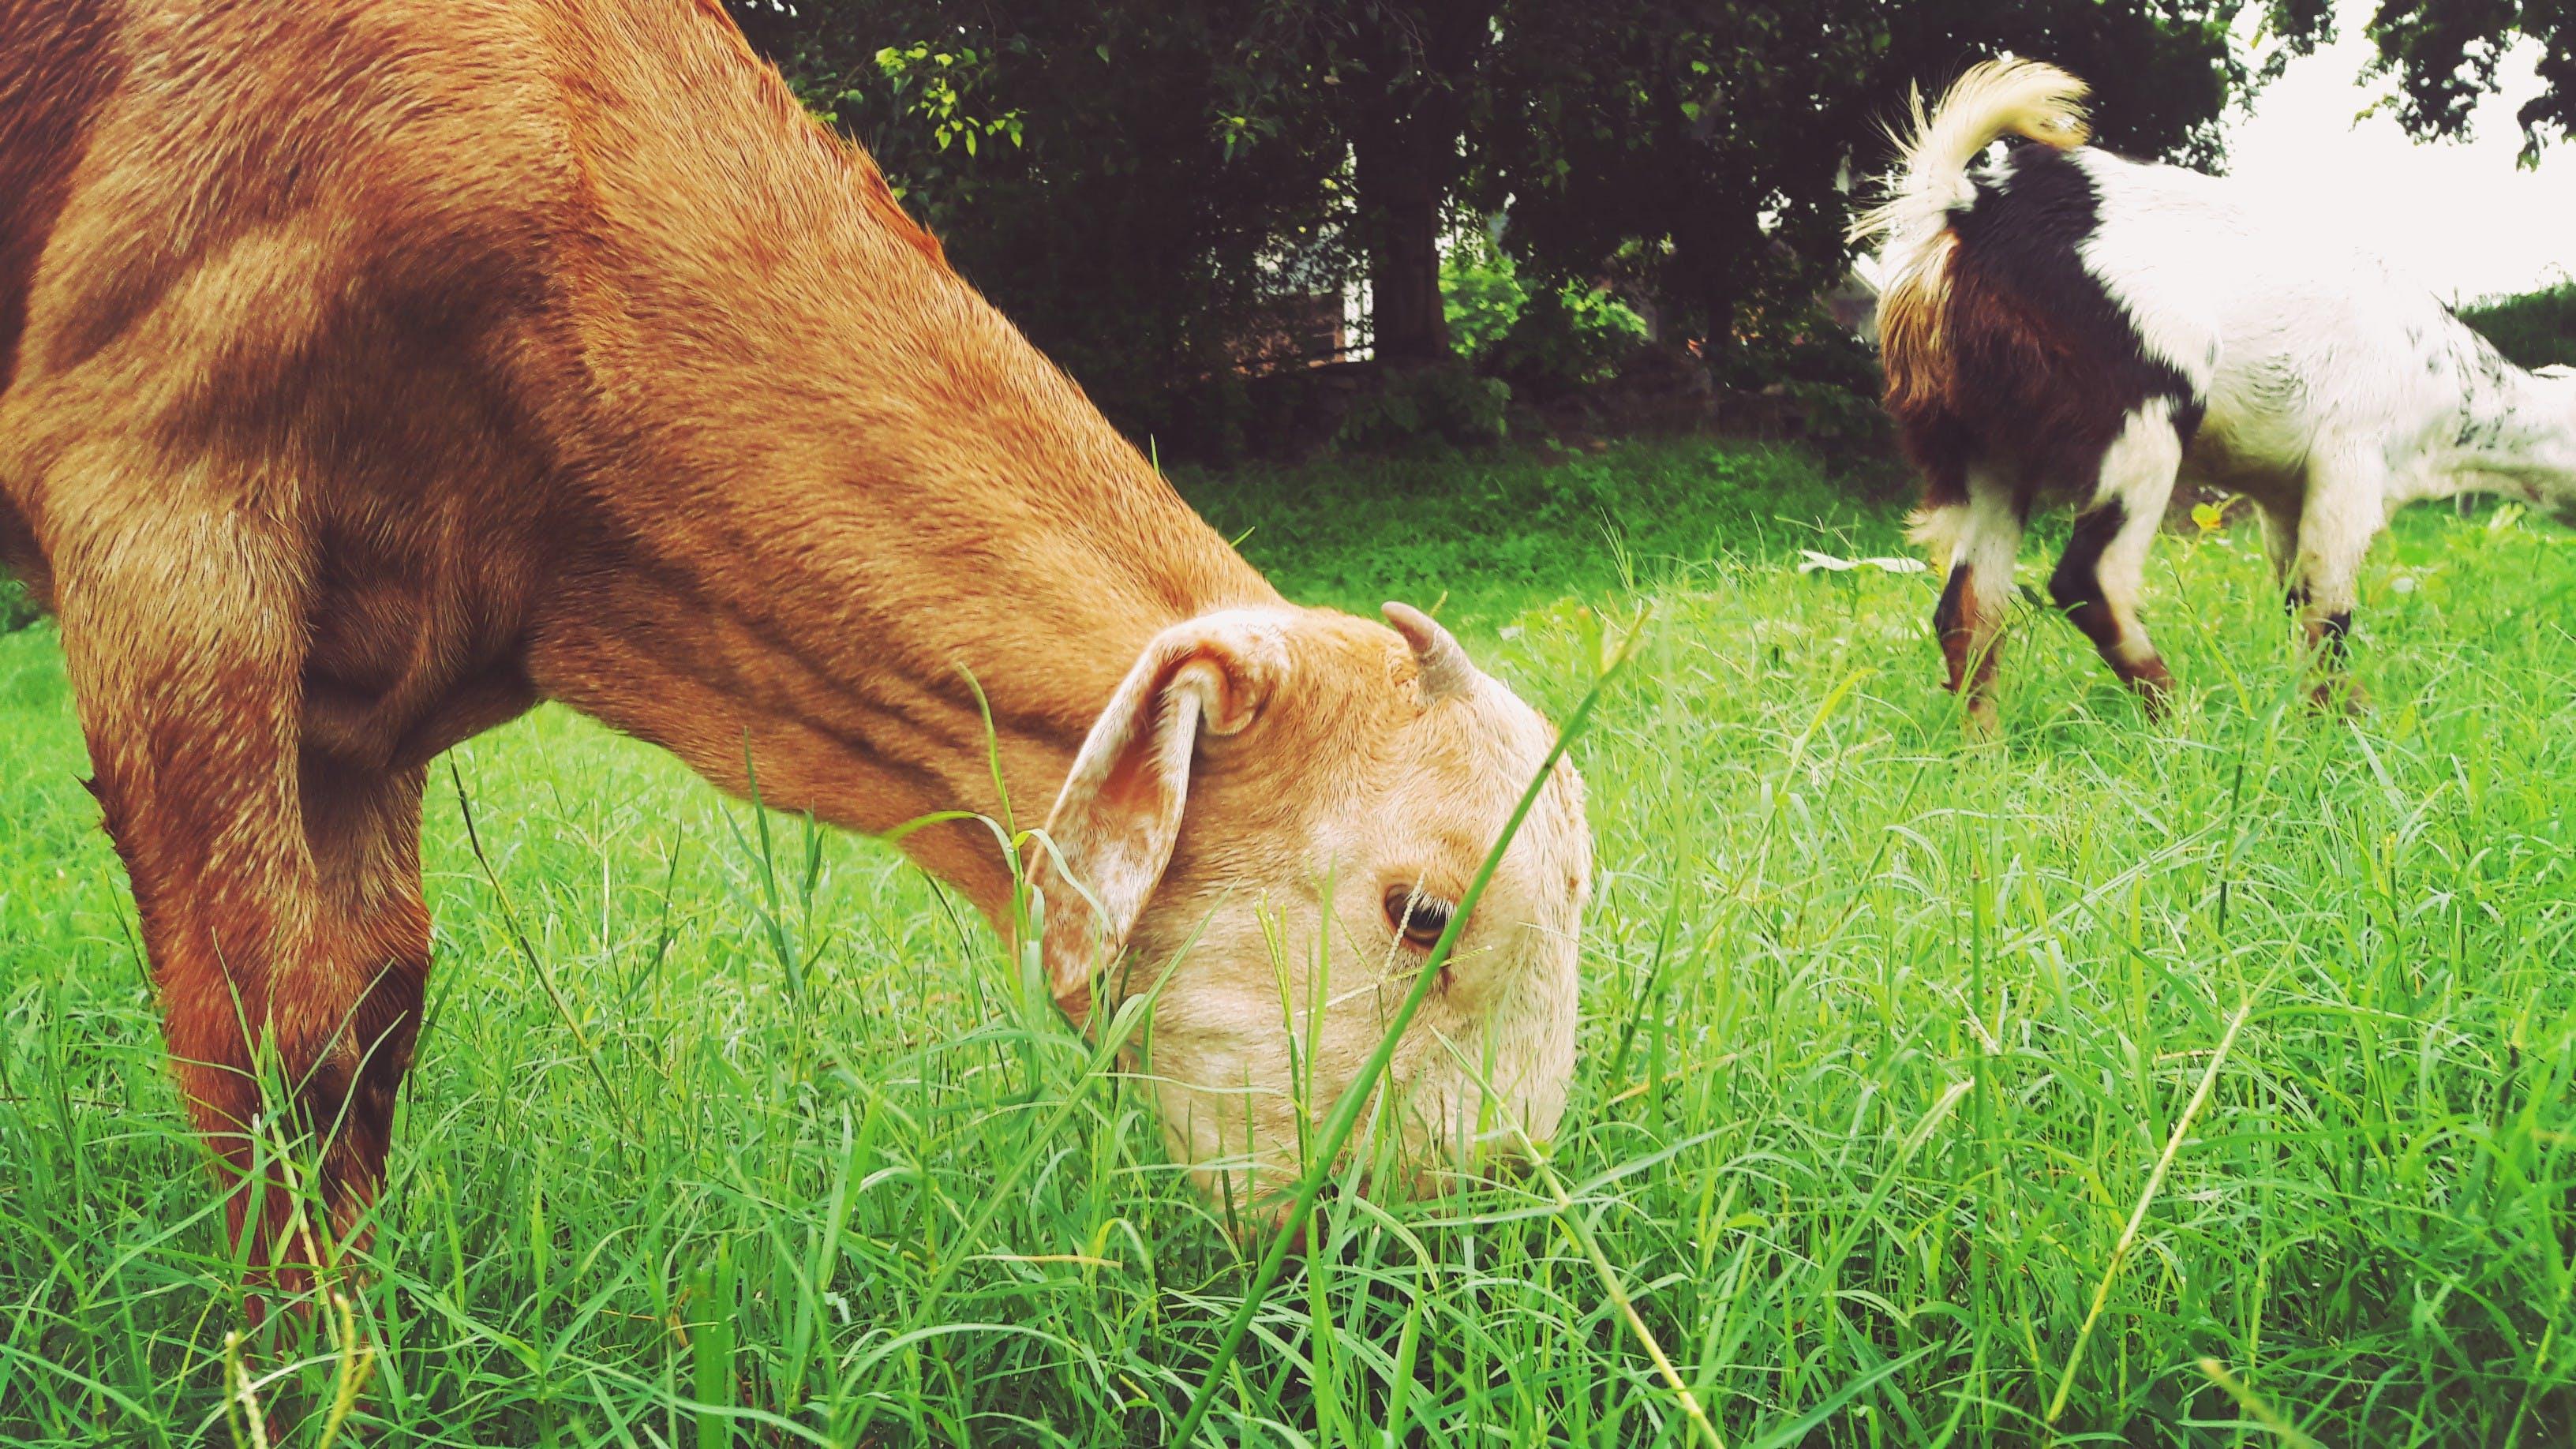 Brown Animal Eating Green Grass